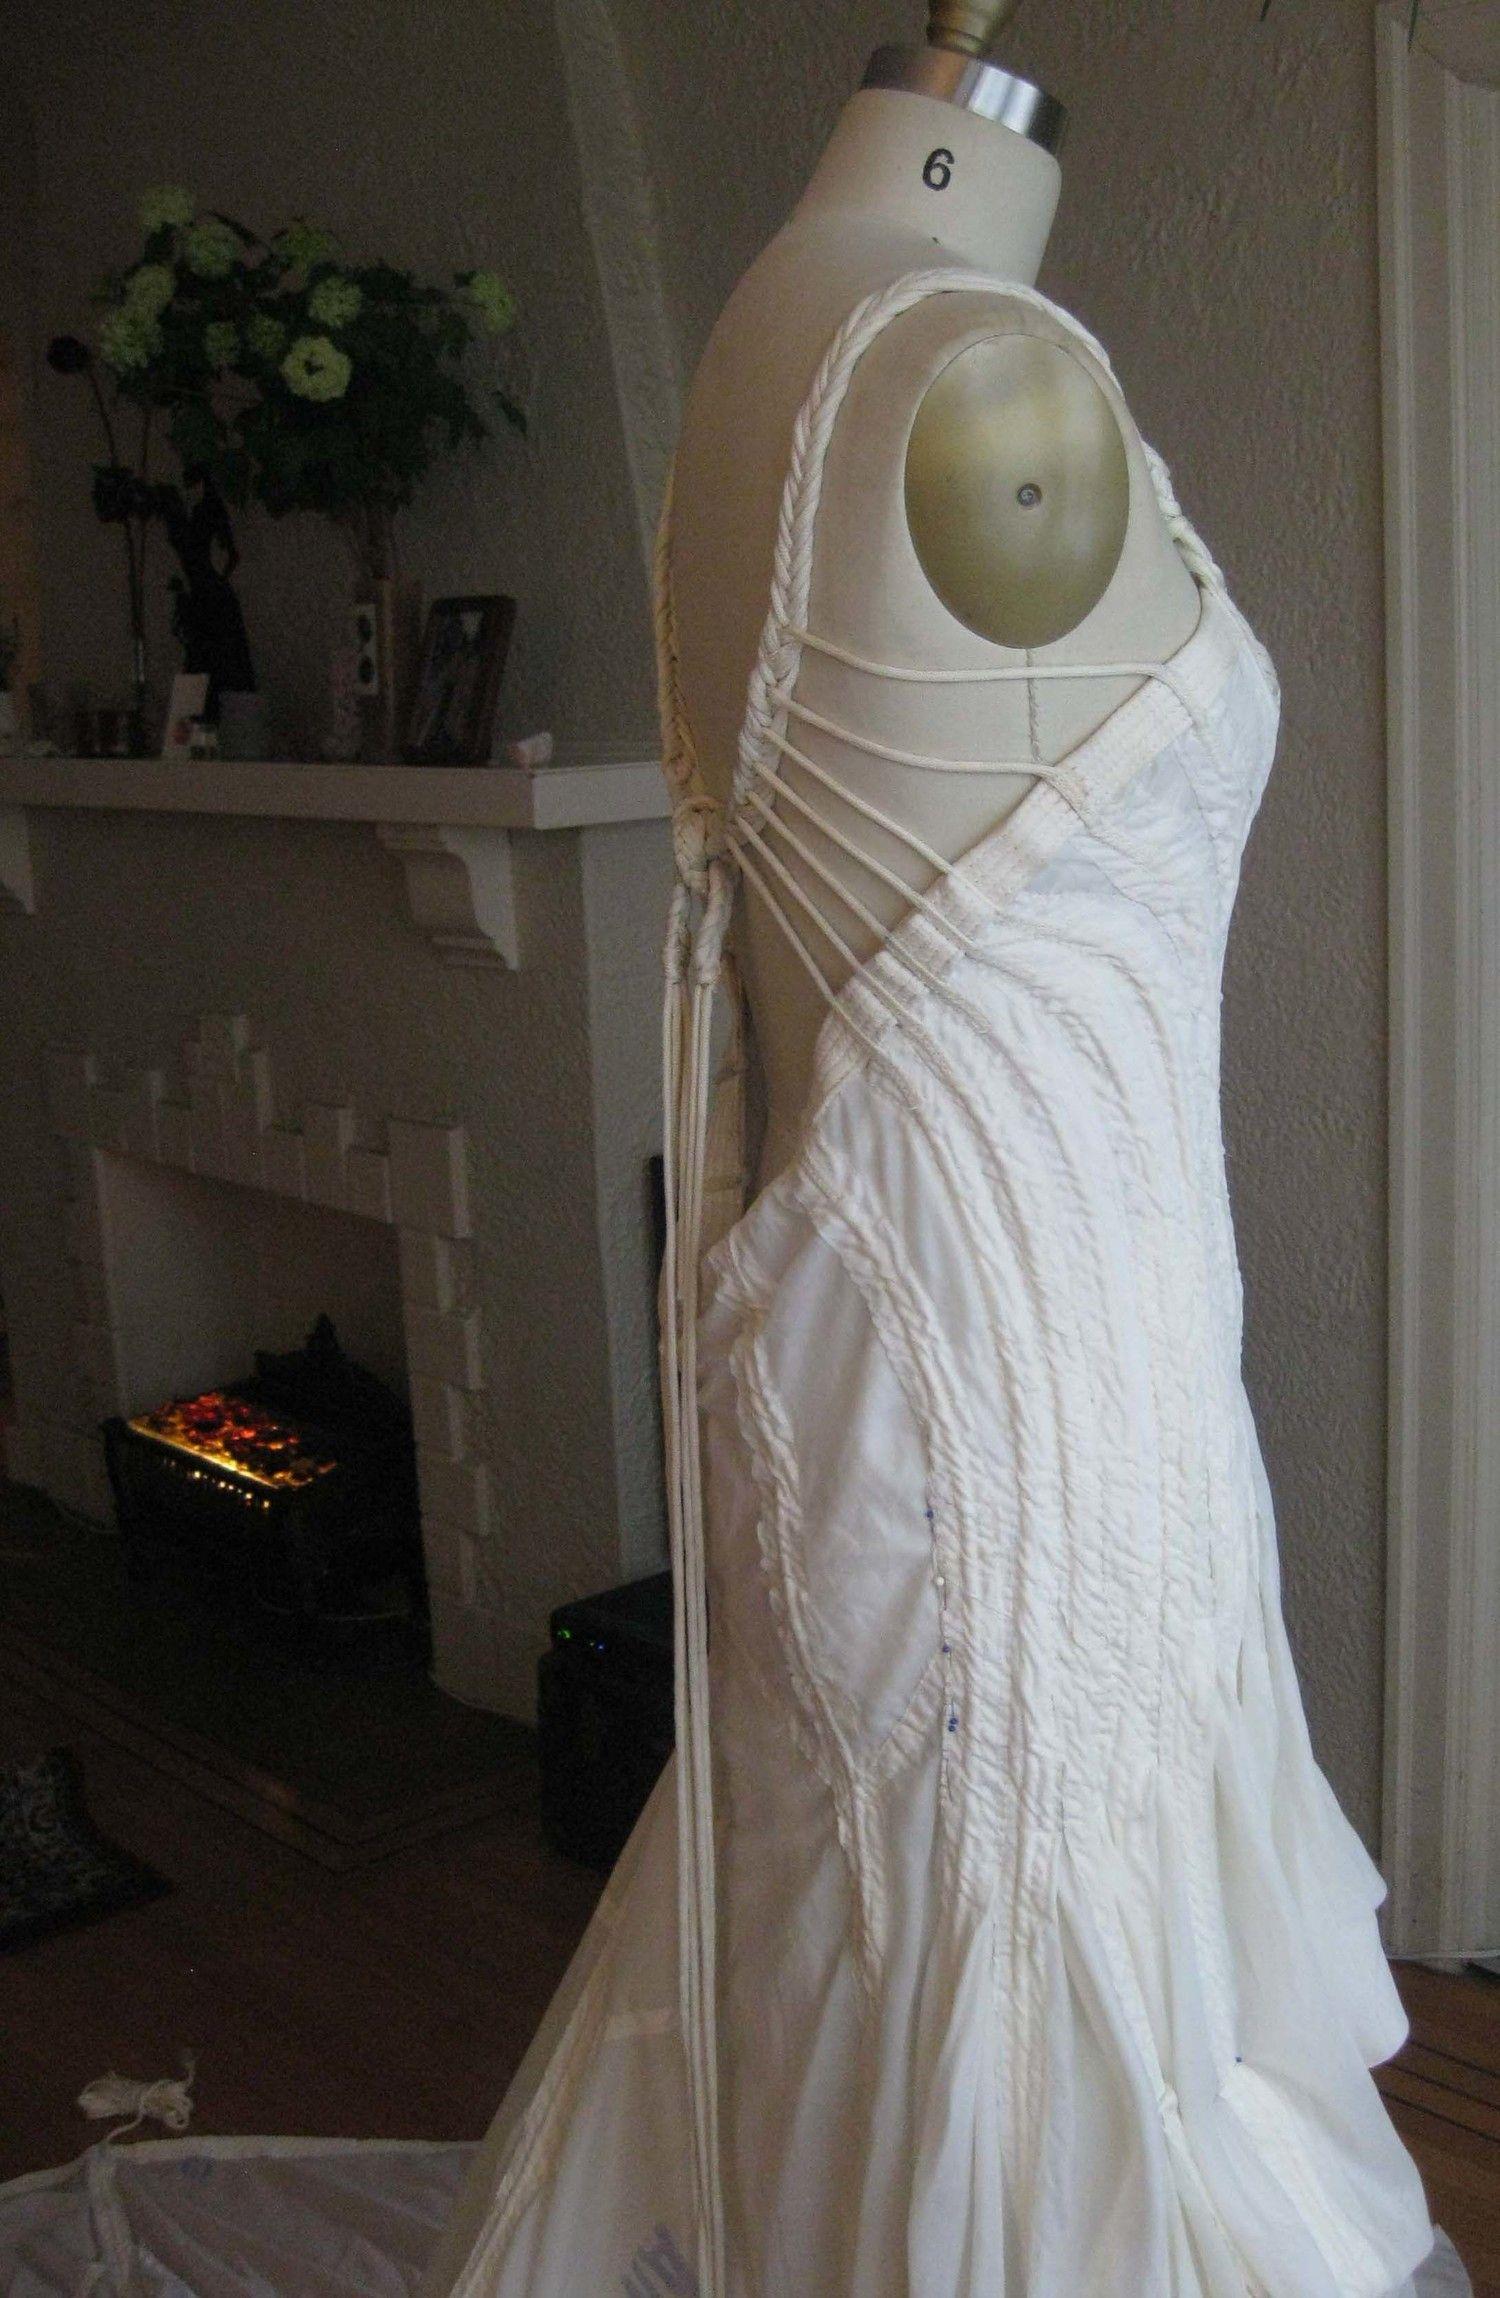 parachute-3-098.jpg   parachute wedding dress